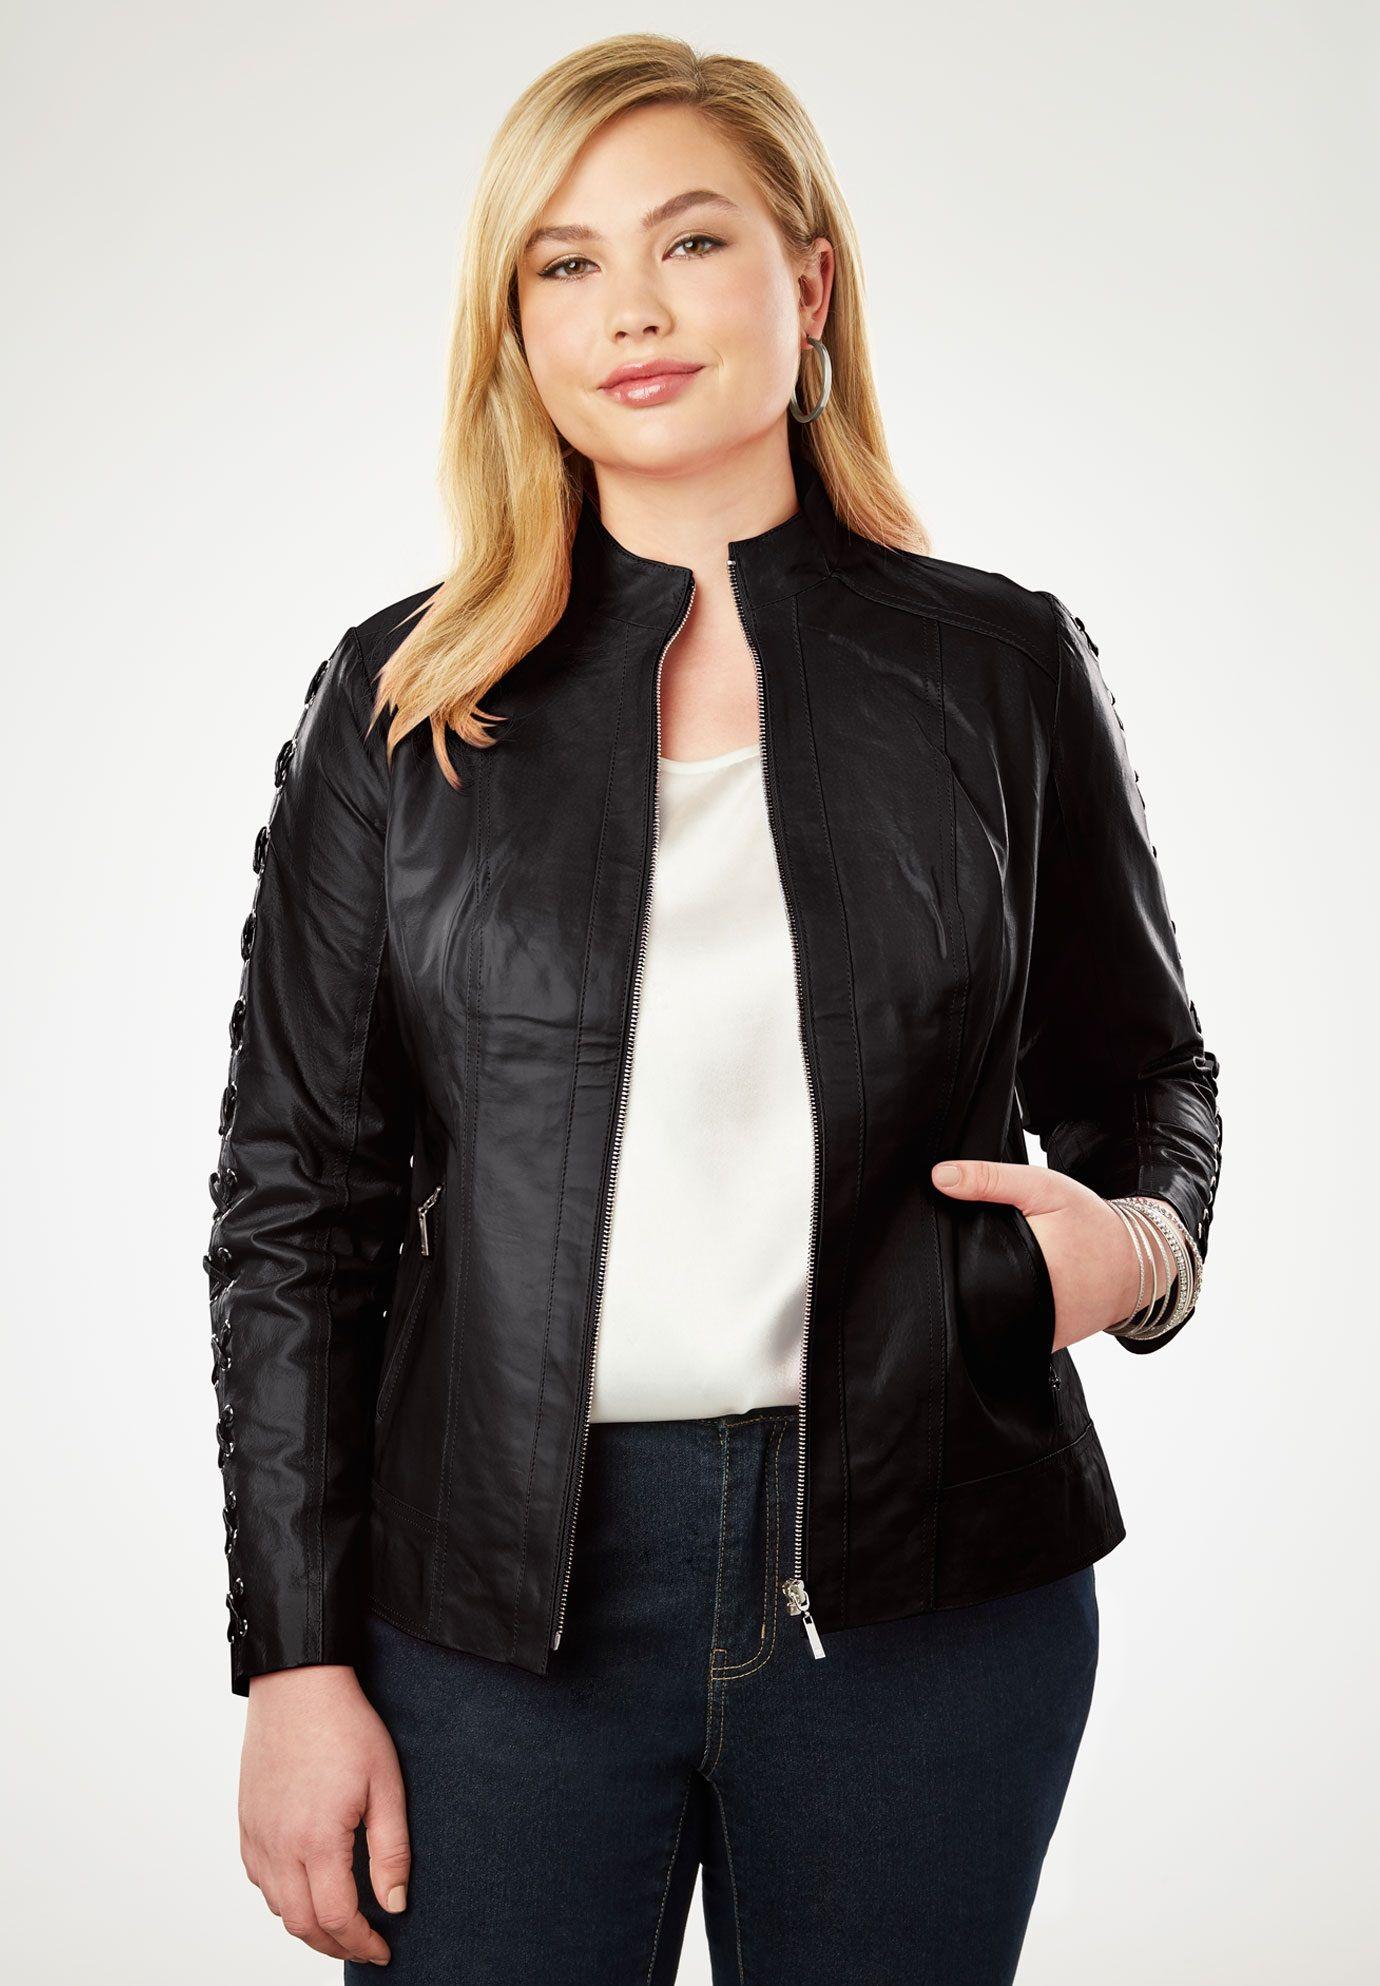 Lace Up Leather Jacket Black Plus Size Leather Jacket Black Leather Jacket Outfit Leather Jackets Women [ 1986 x 1380 Pixel ]